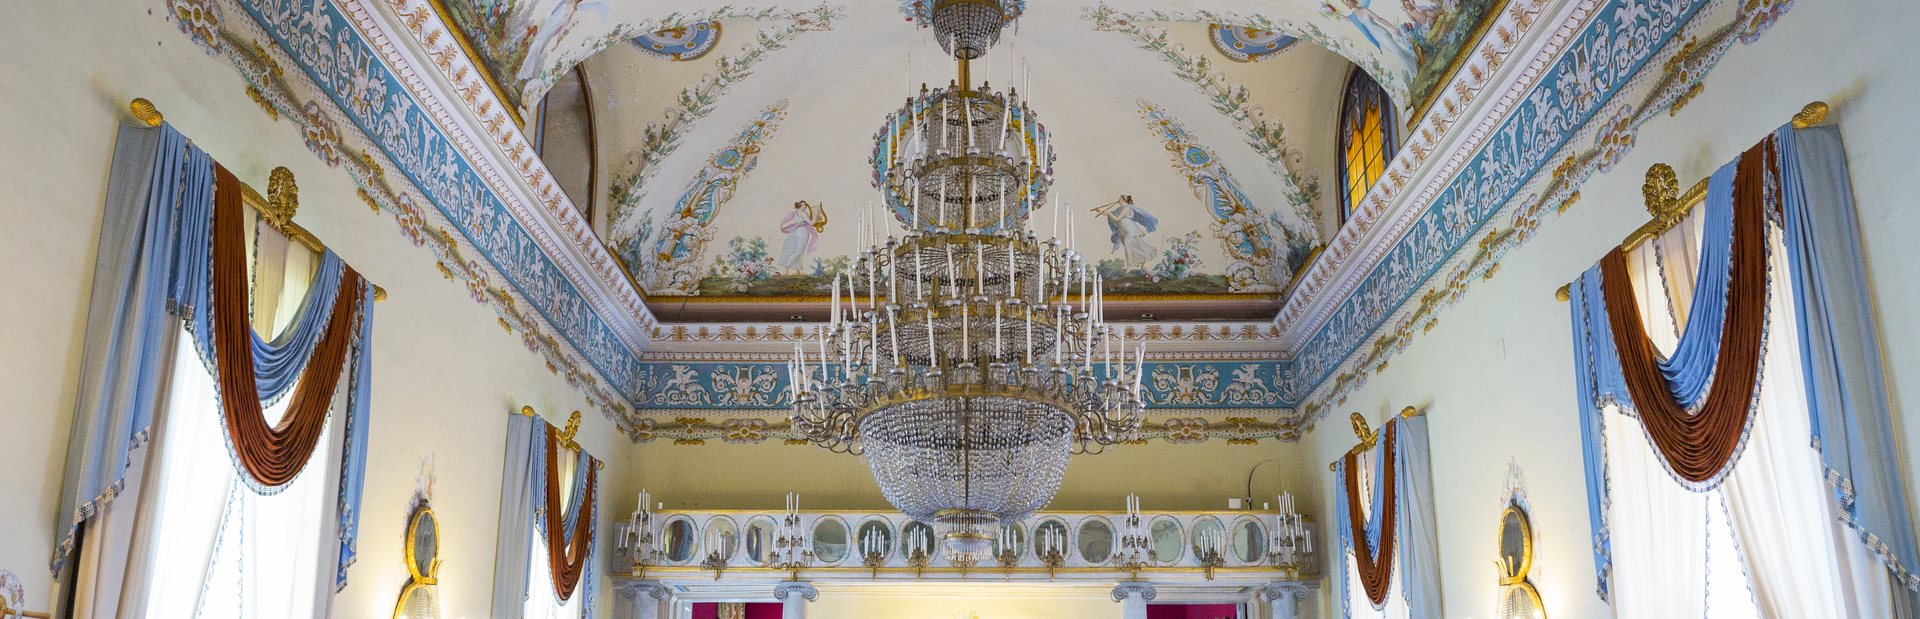 Royal Palace of Naples Image 1